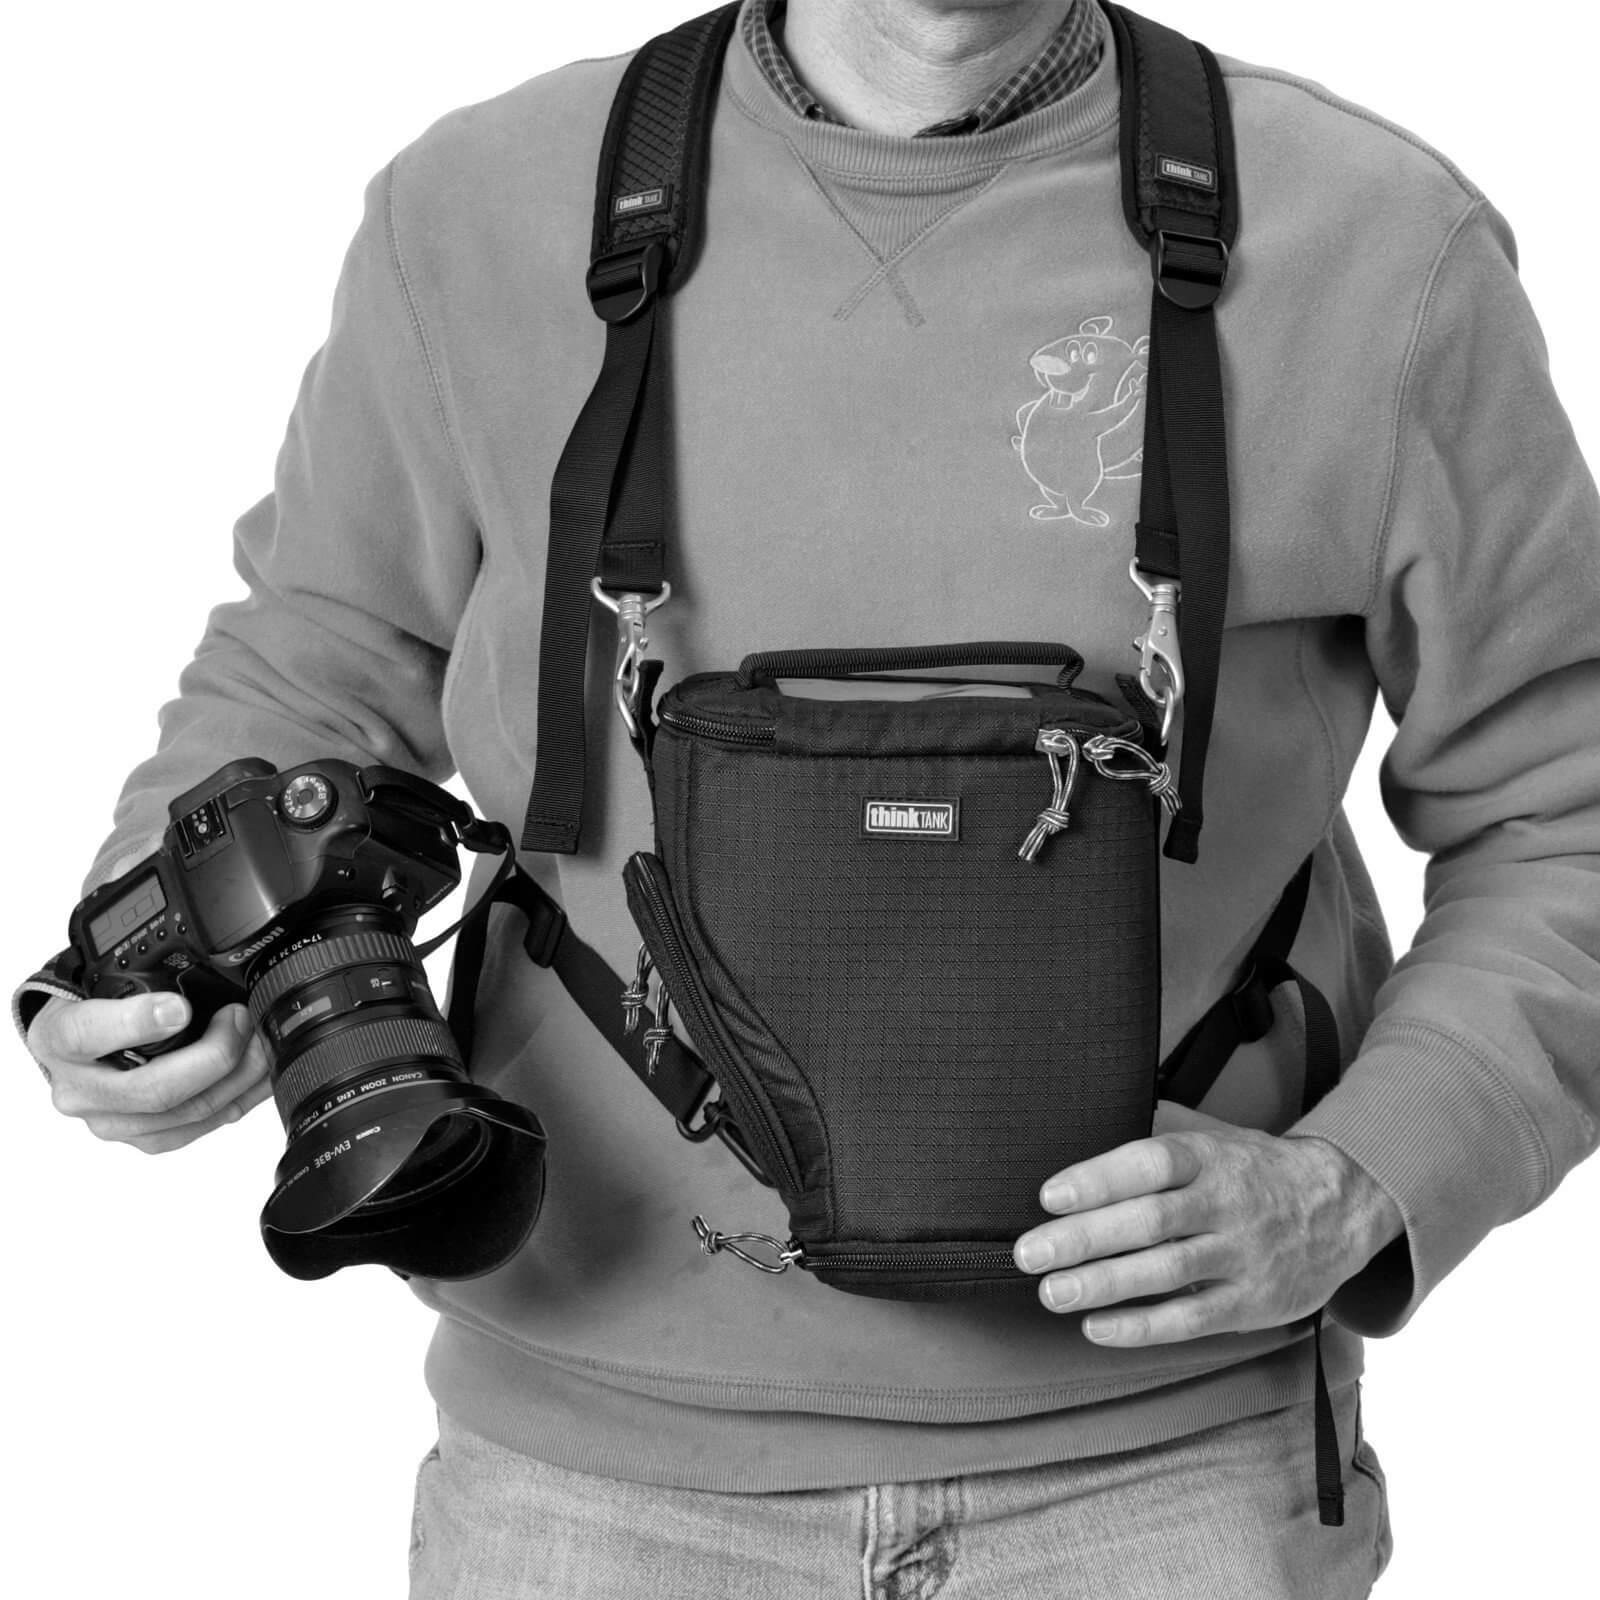 ThinkTank Brustgurt Digital Holster Harness,雙肩背帶 ,DH886